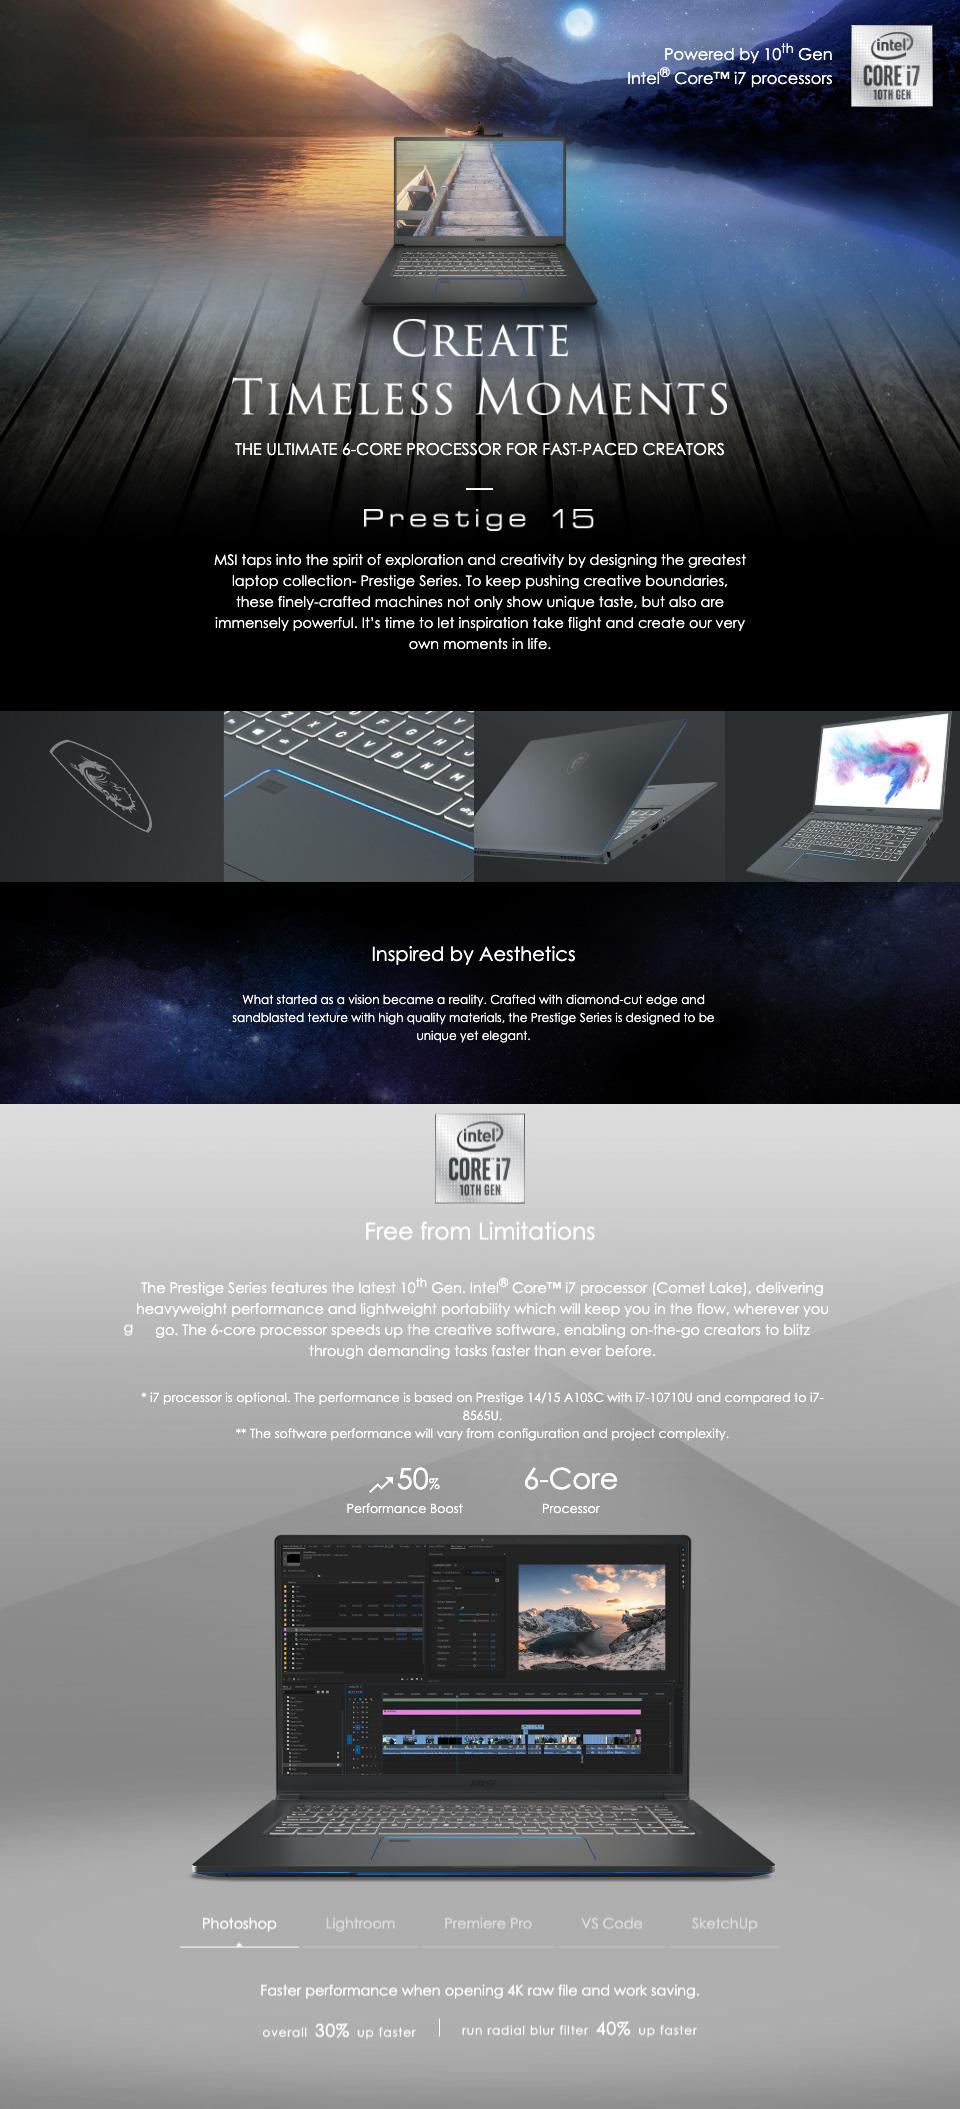 MSI Prestige 15 A10SC GTX1650 15in  UHD 100% ADOBE RGB Notebook features